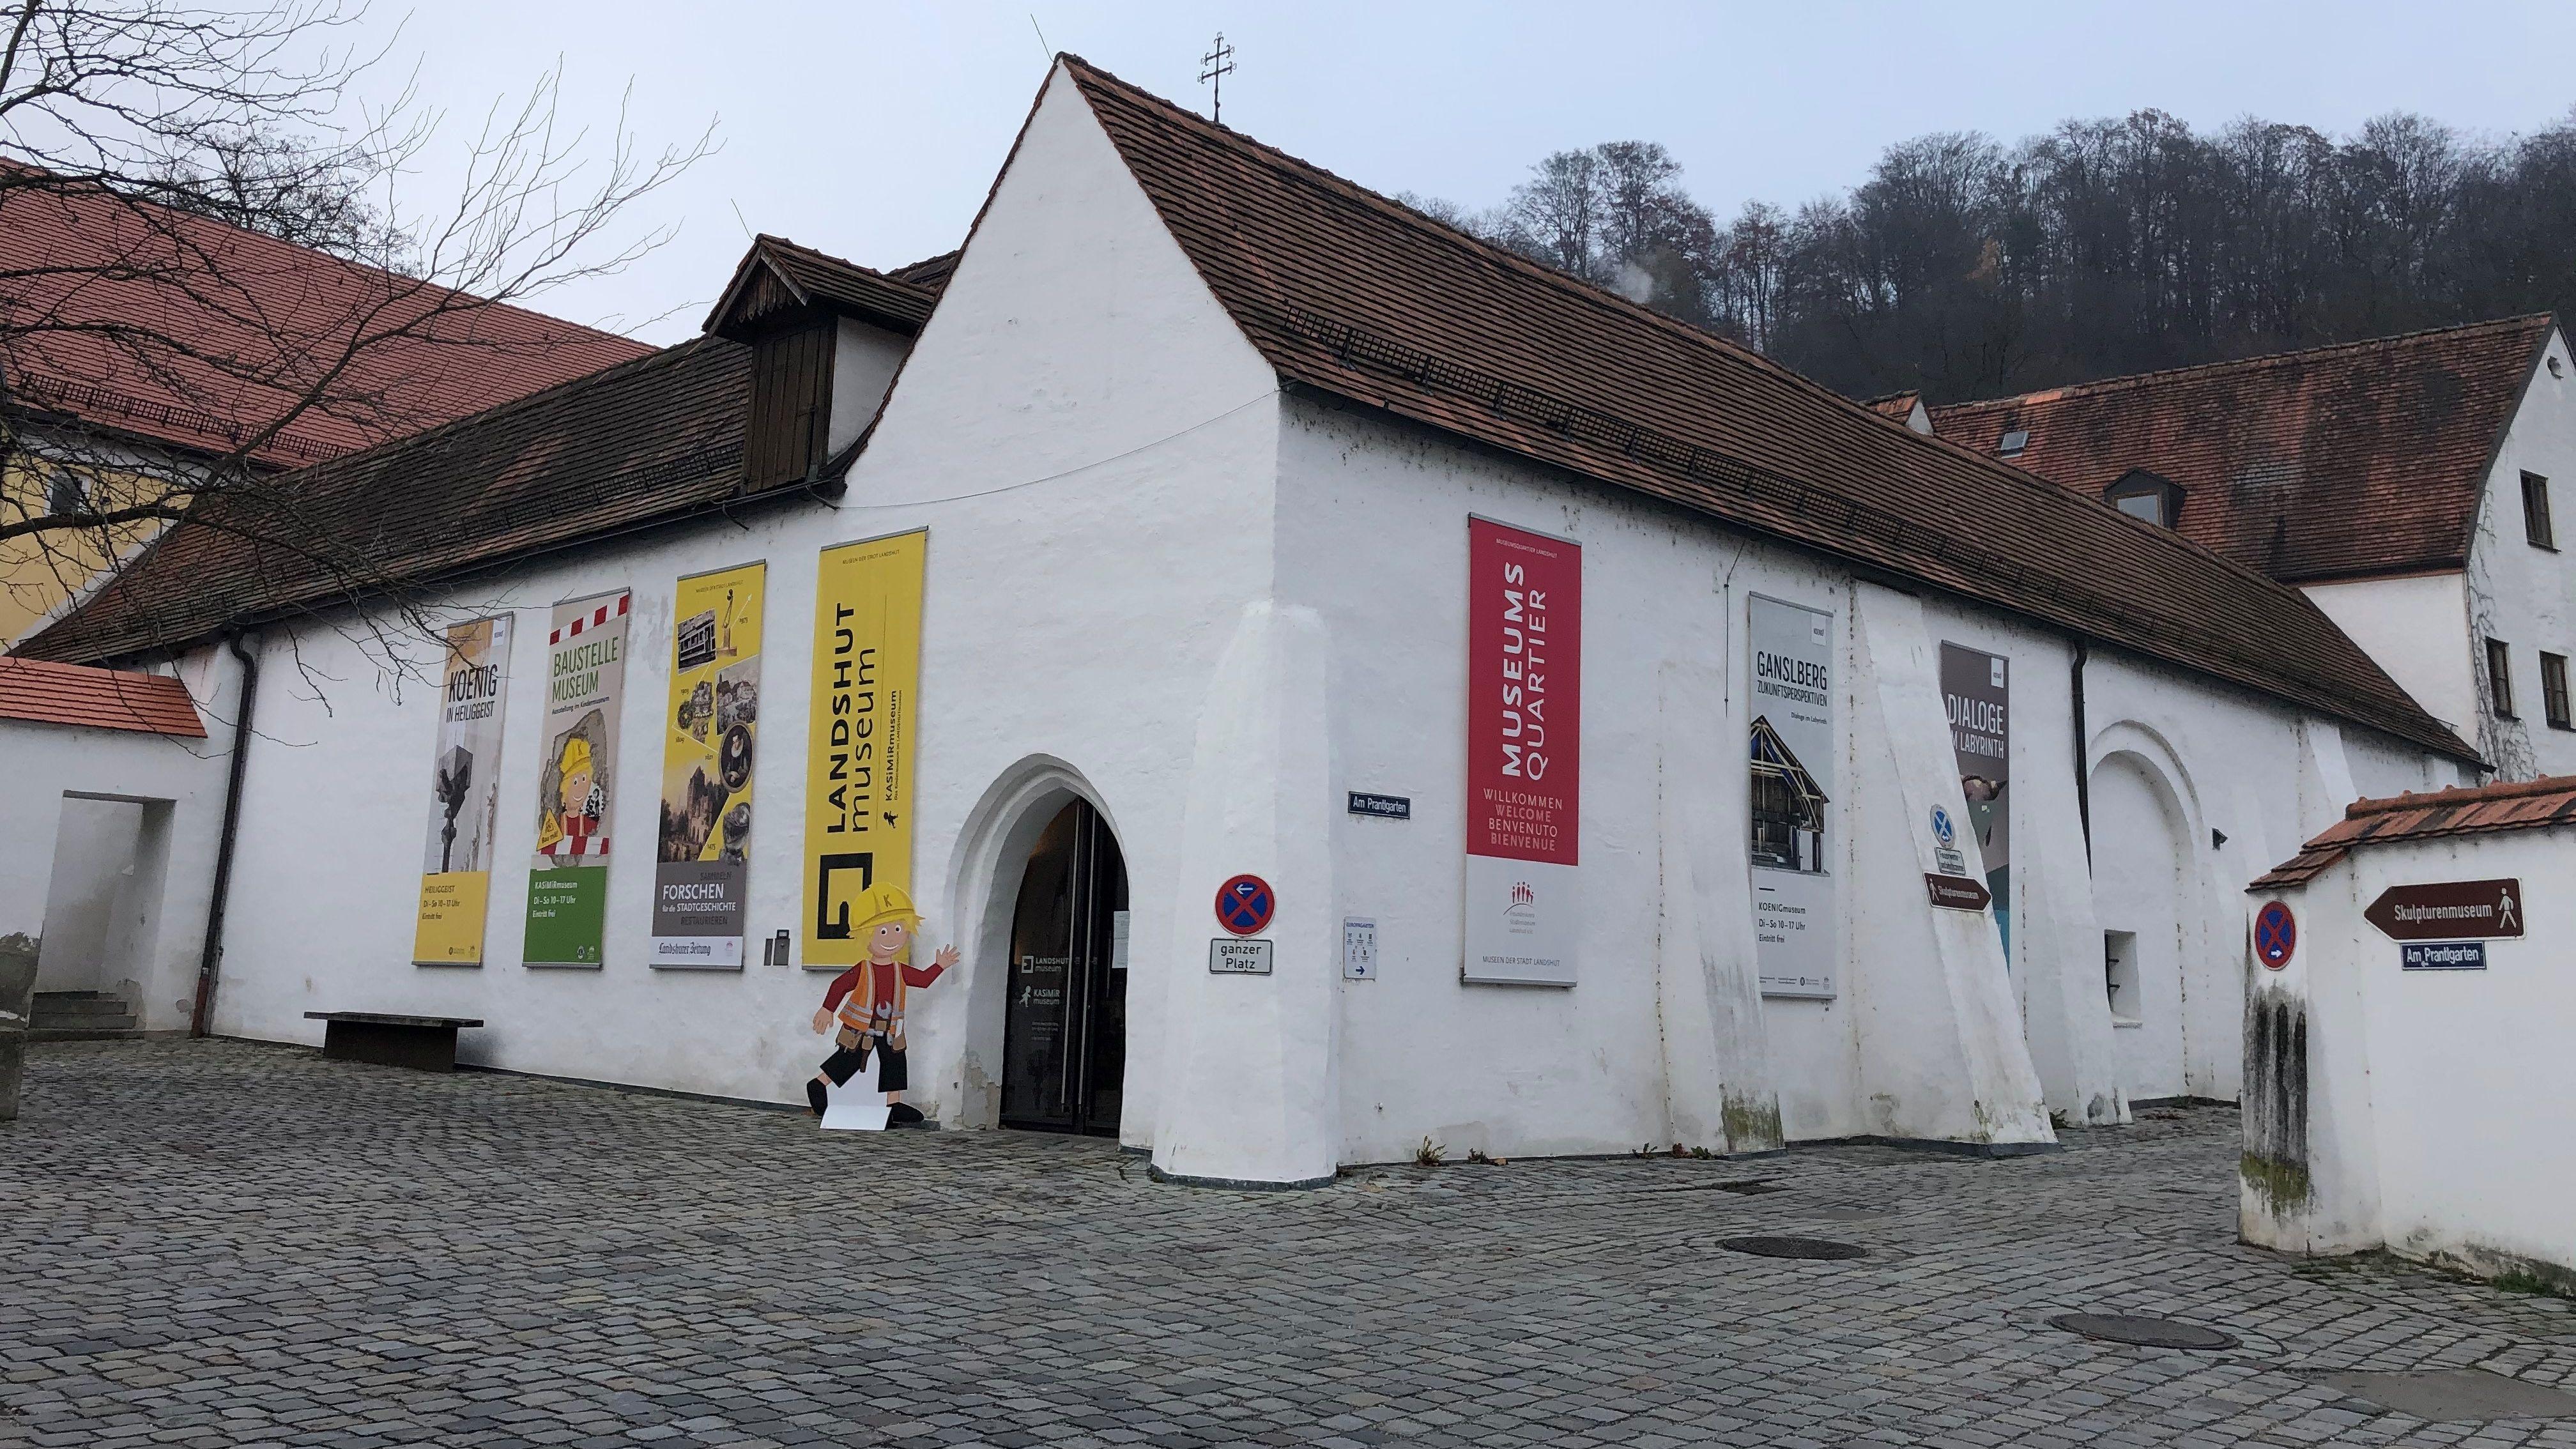 Museumsquartier in Landshut